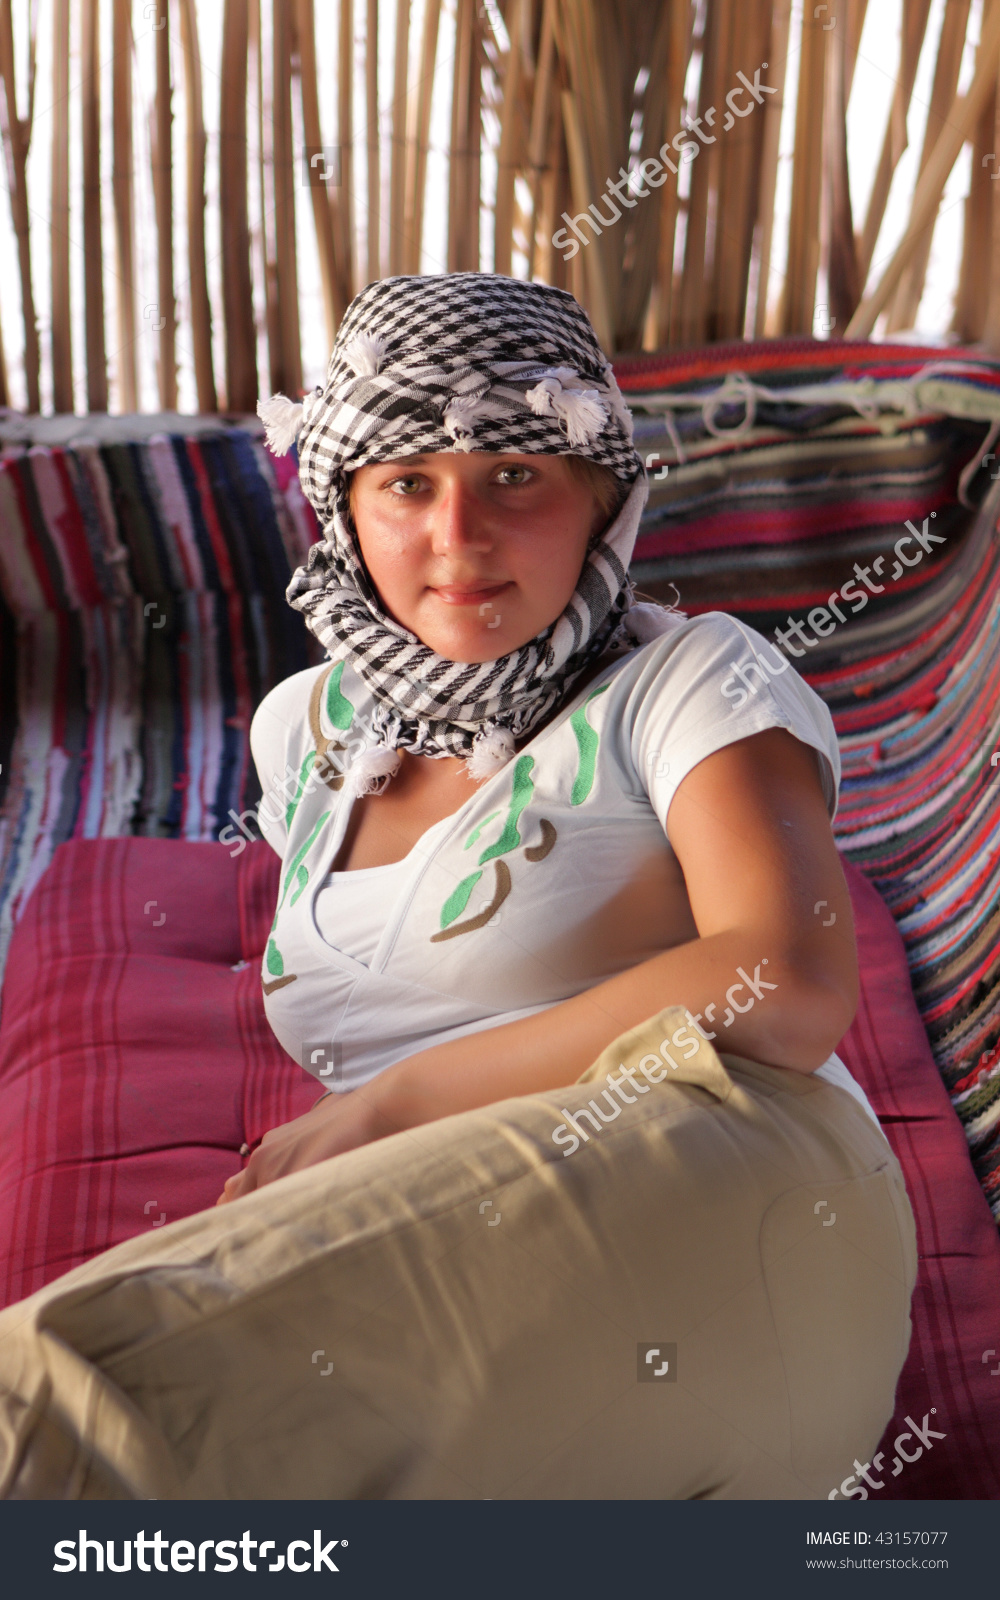 Woman Rests Bedouin Tent Desert Excursion Stock Photo 43157077.